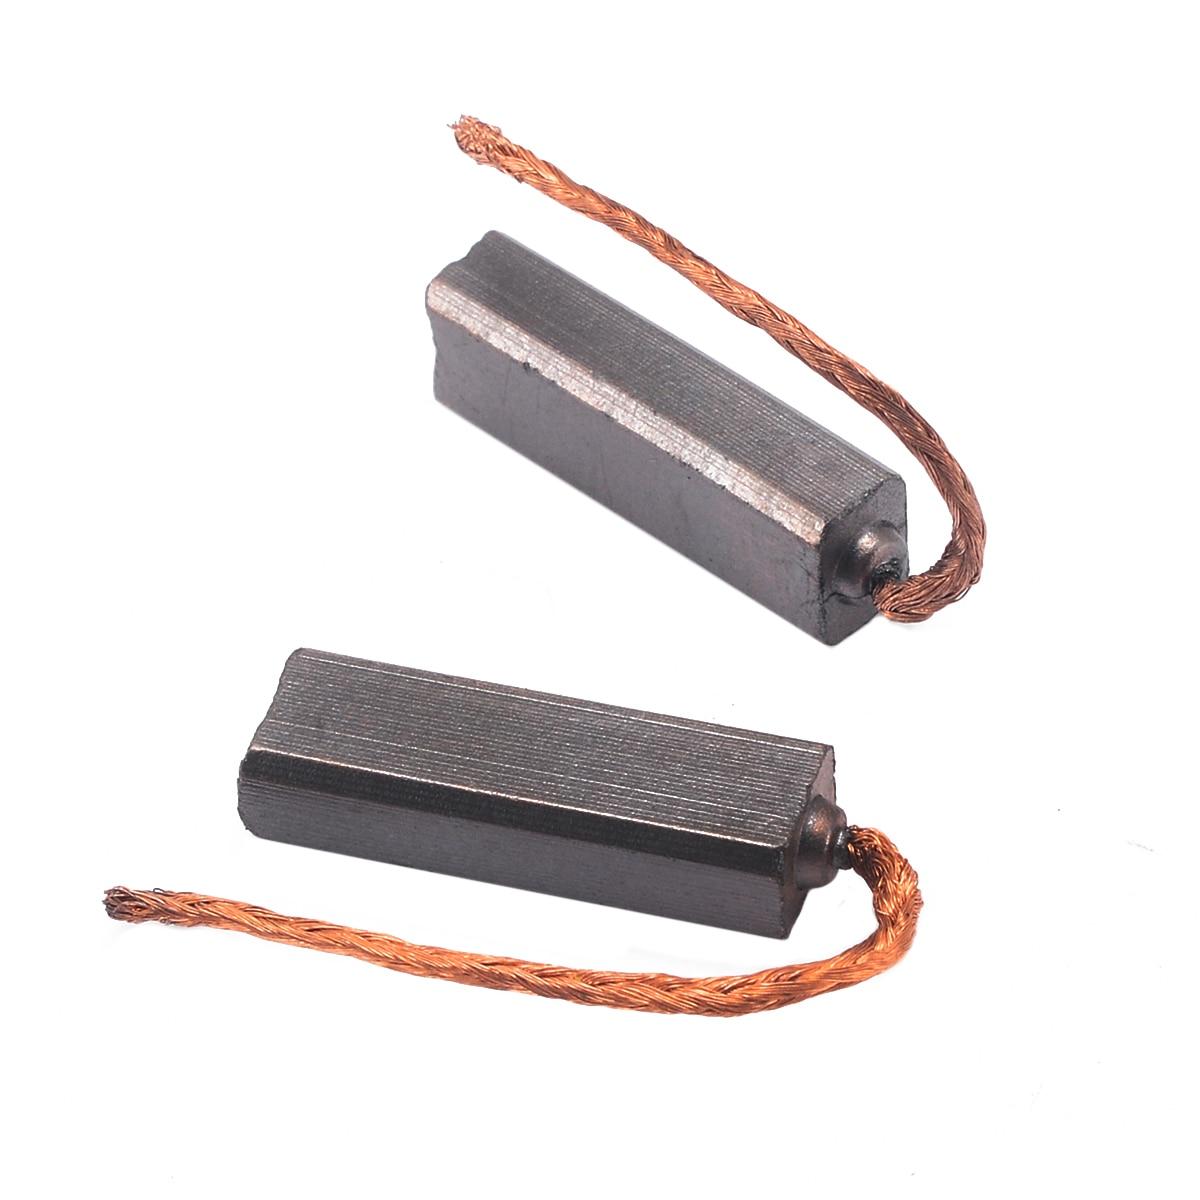 10pcs/set Mini Electric Motor Carbon Brushes Wire For Automotive Car Generator Generic Conductive Motor Brush 4.5X6.5X20mm